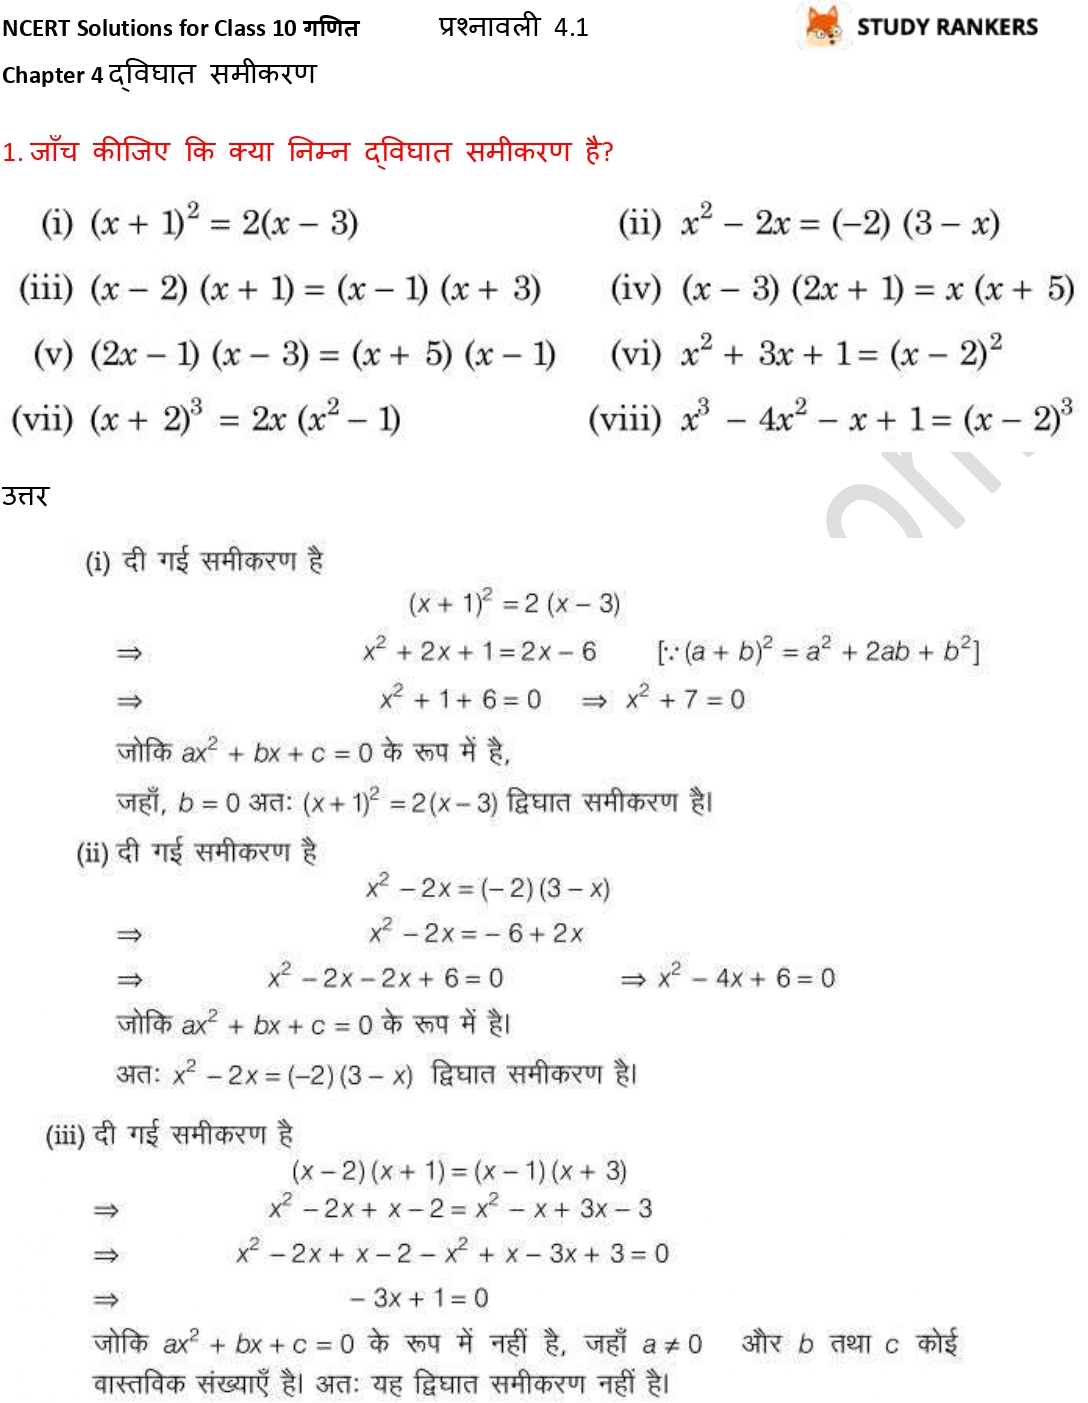 NCERT Solutions for Class 10 Maths Chapter 4 द्विघात समीकरण प्रश्नावली 4.1 Part 1